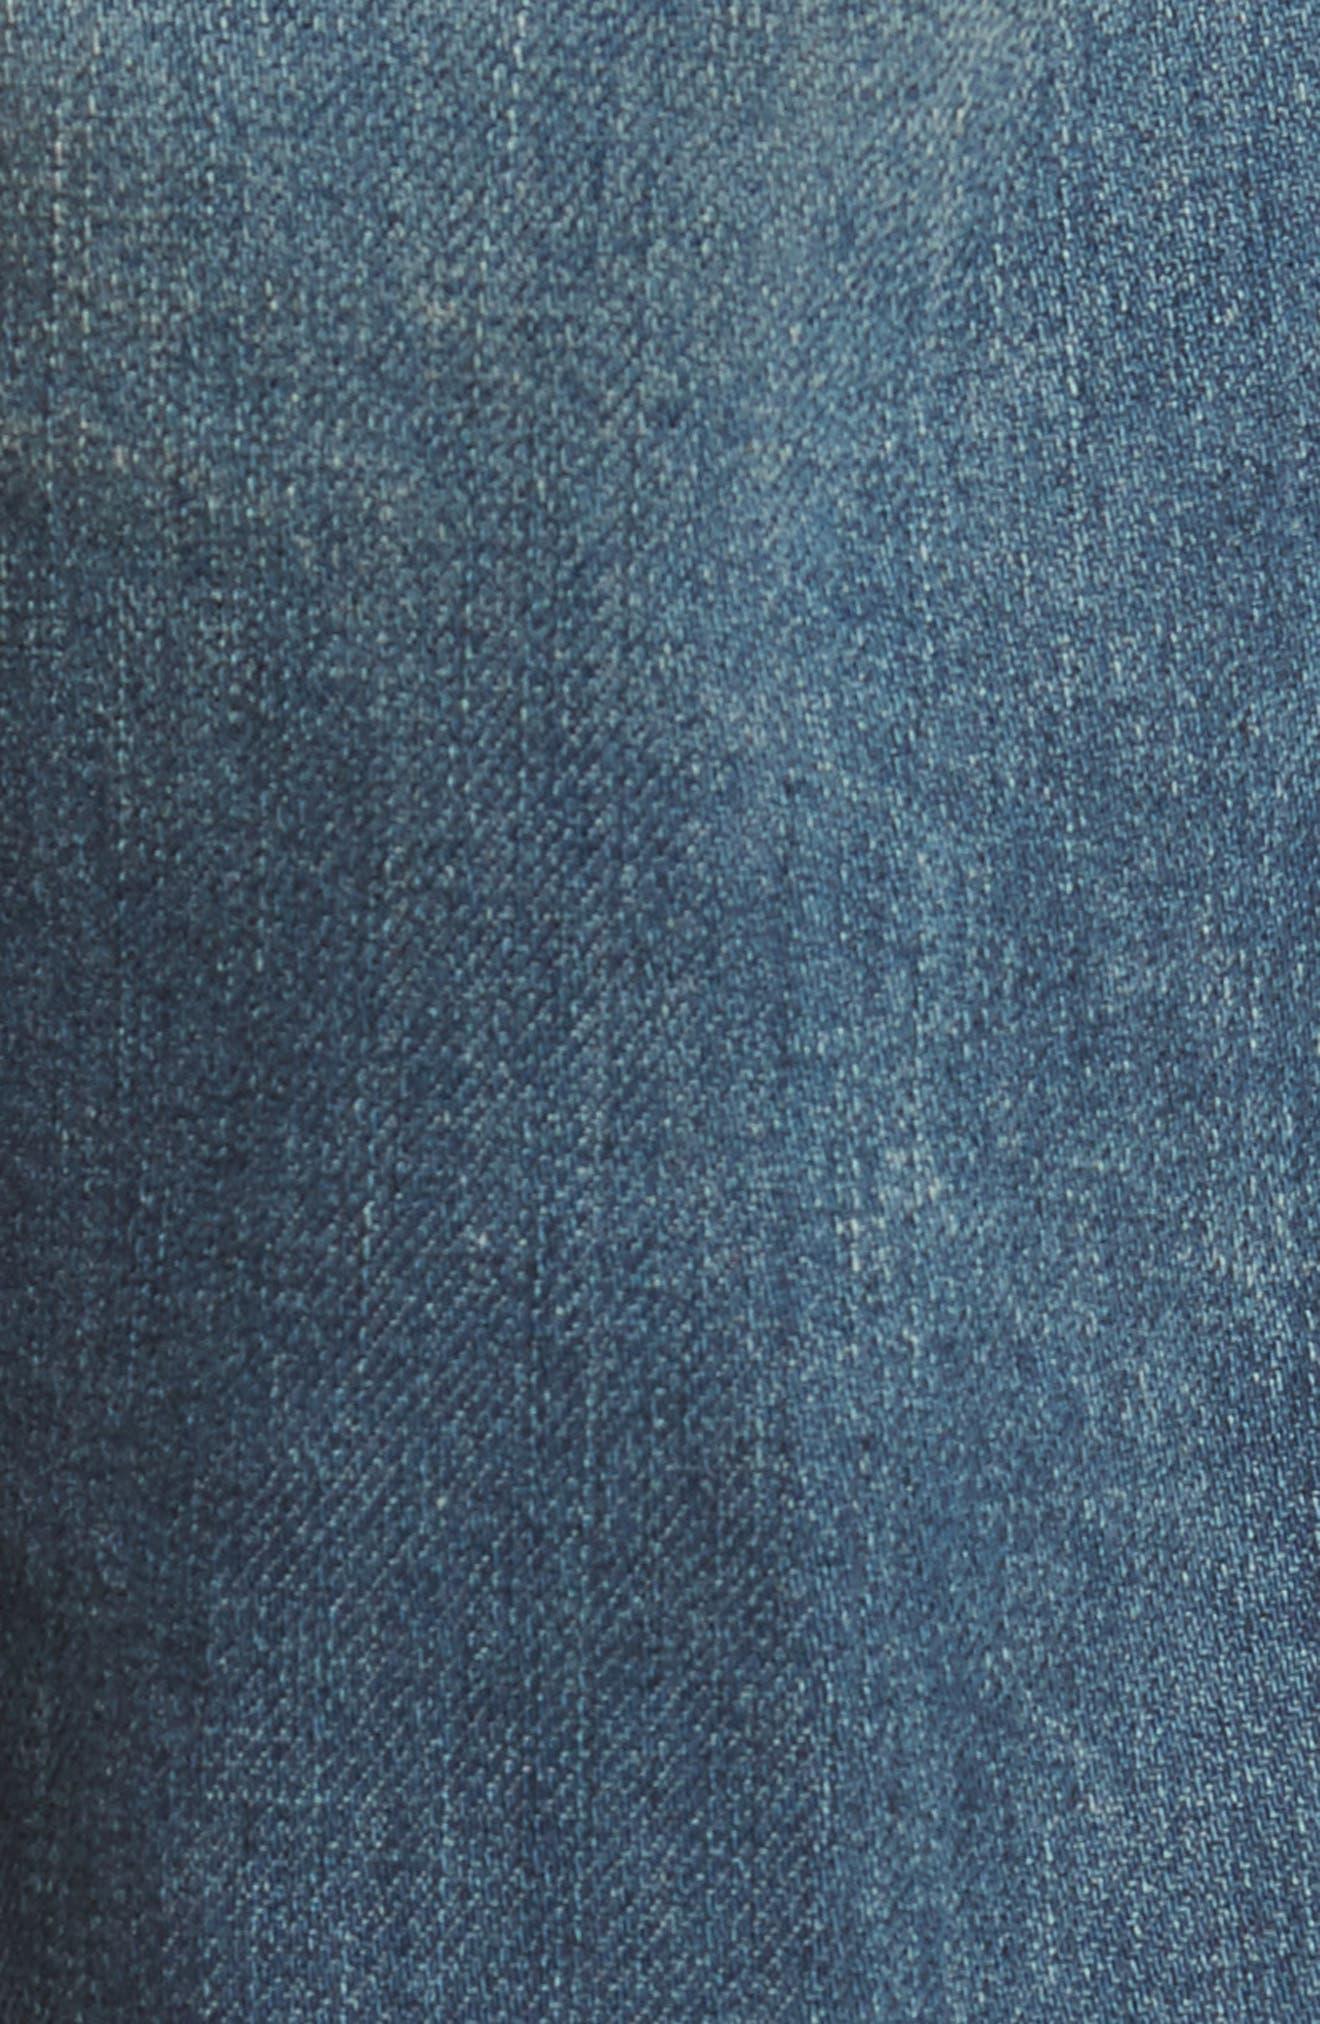 Dylan Slim Skinny Fit Jeans,                             Alternate thumbnail 5, color,                             451